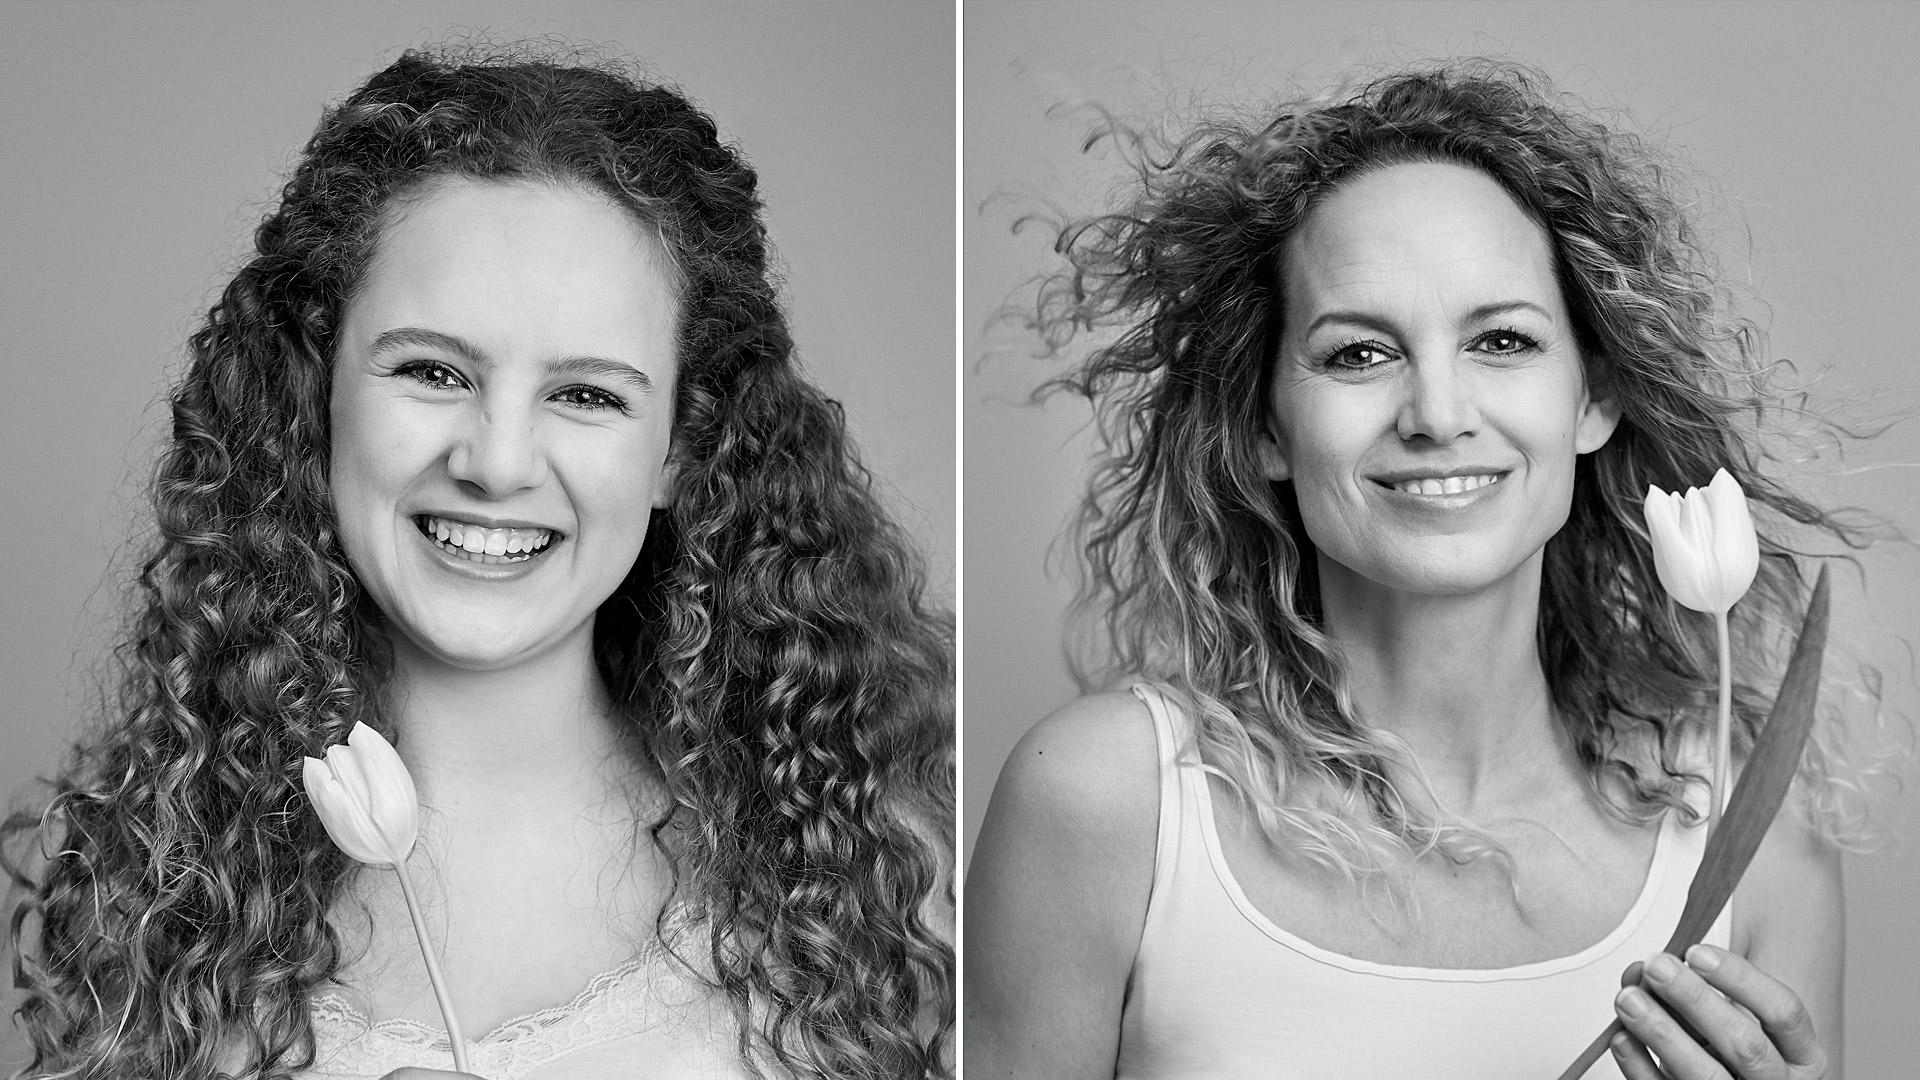 werbung-studio-portrait-dortmund-models-imagefotograf